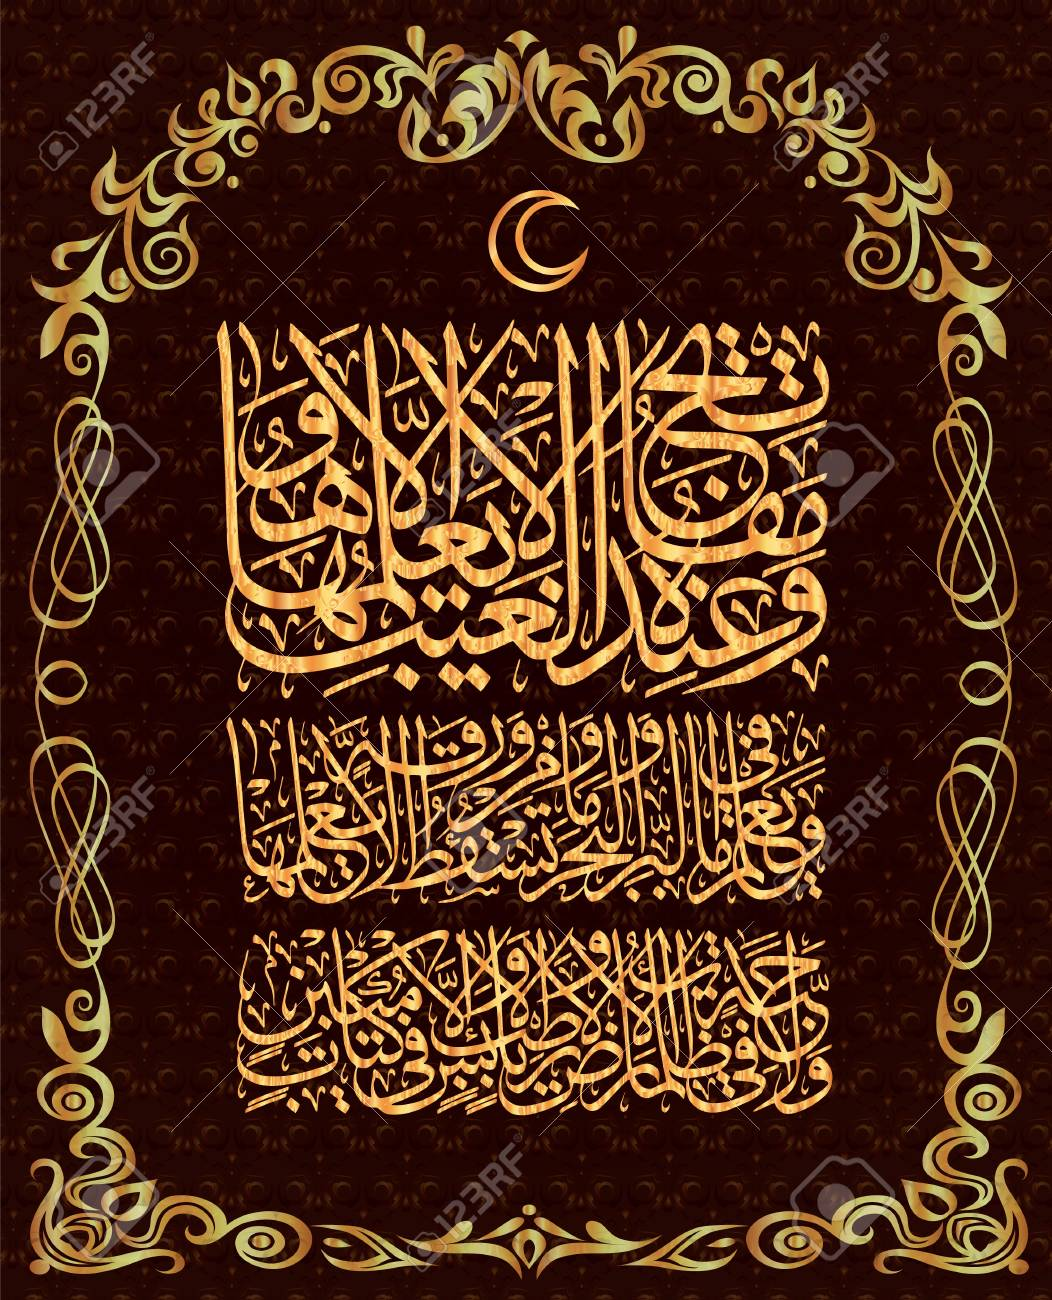 Image result for calligraphy Surah Al isra